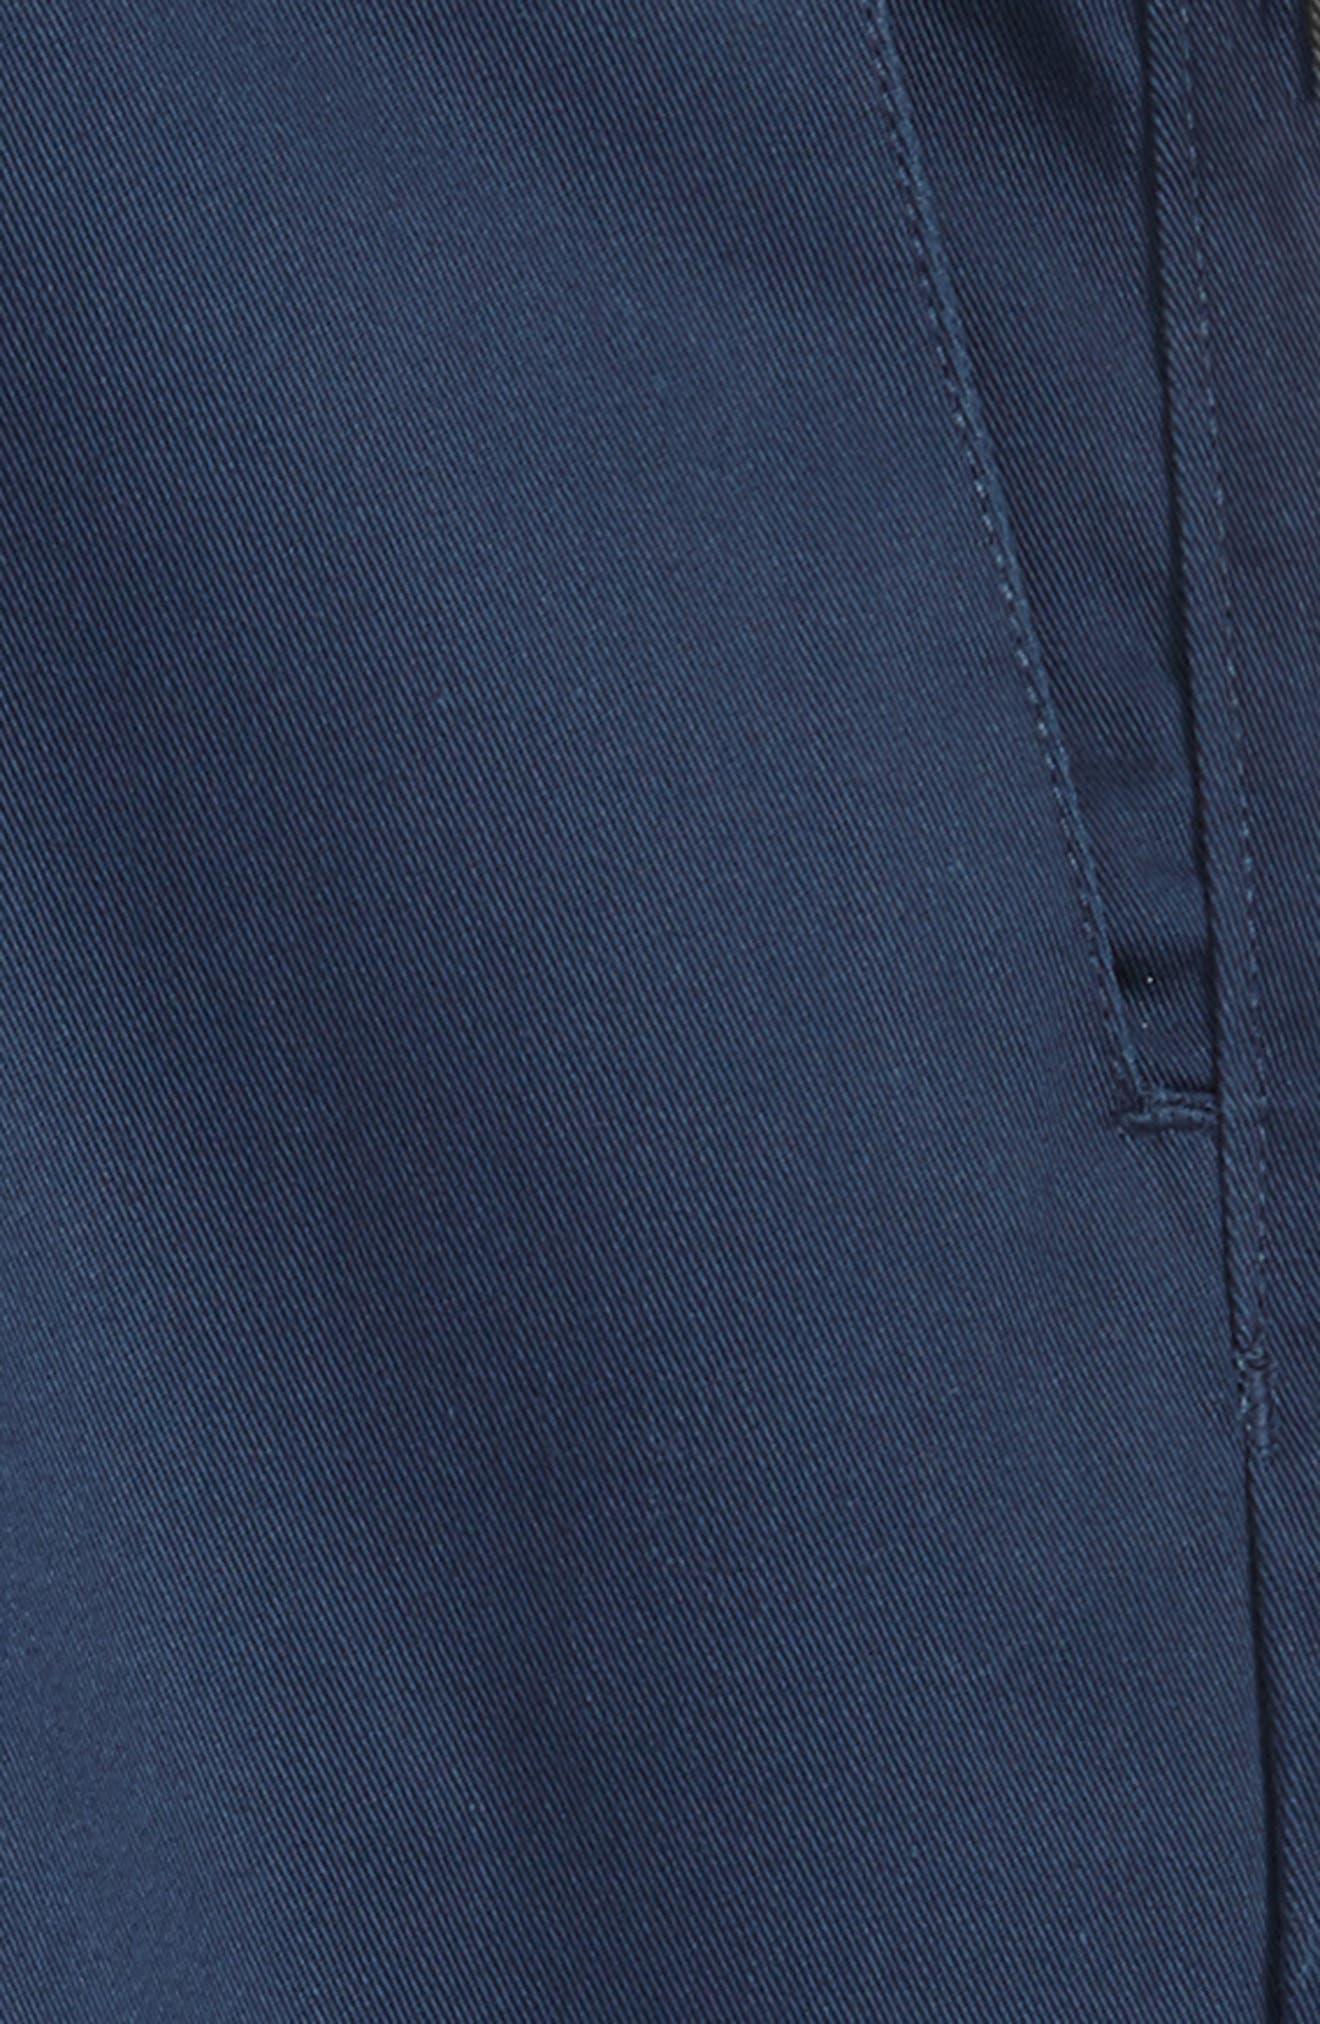 Chino Shorts,                             Alternate thumbnail 2, color,                             SERVICE BLUE